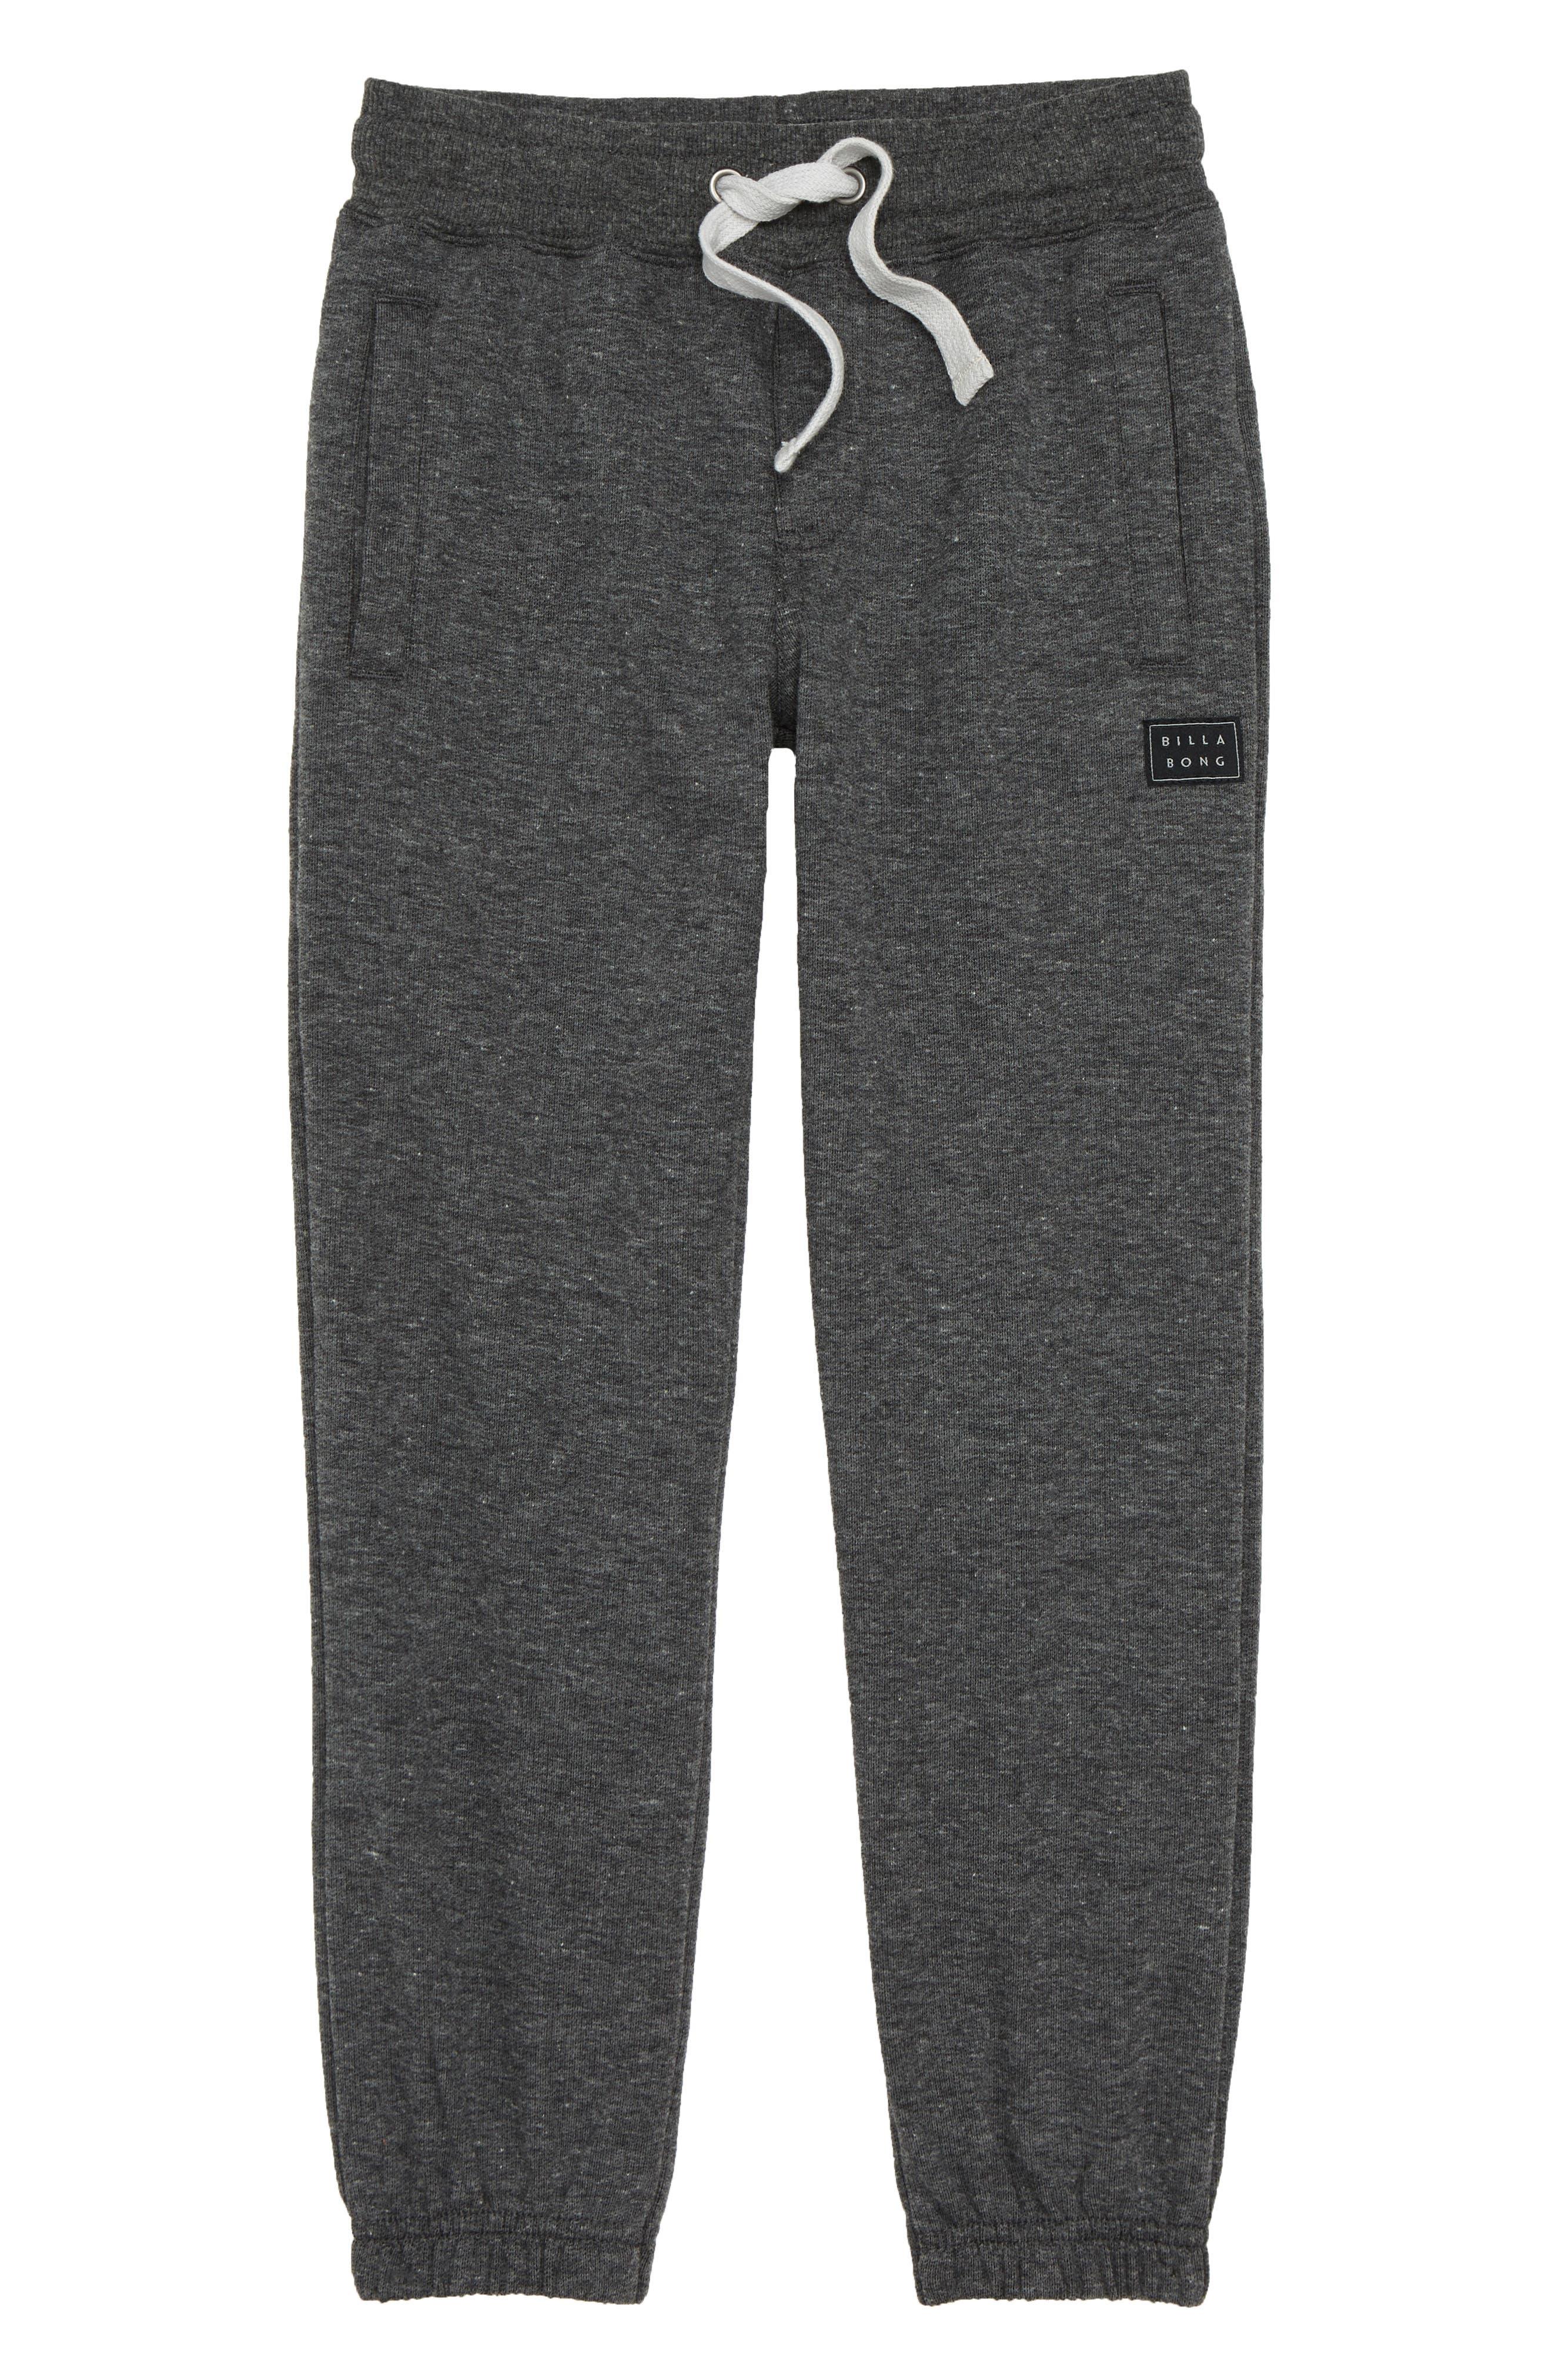 All Day Sweatpants,                             Main thumbnail 1, color,                             BLACK